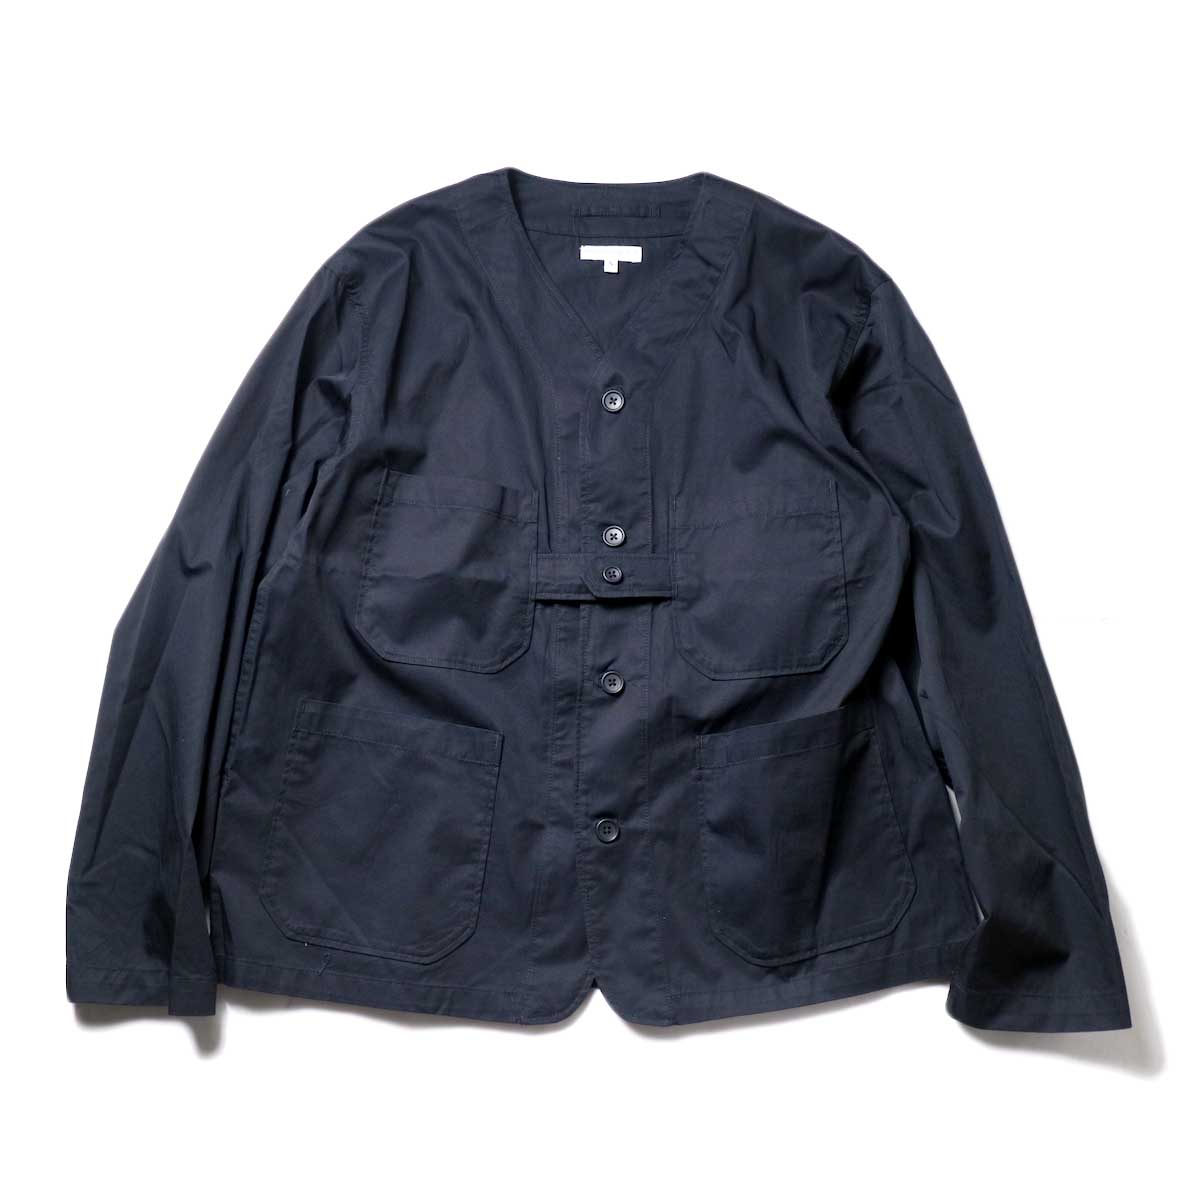 Engineered Garments / Cardigan Jacket -High Count Twill (Black)